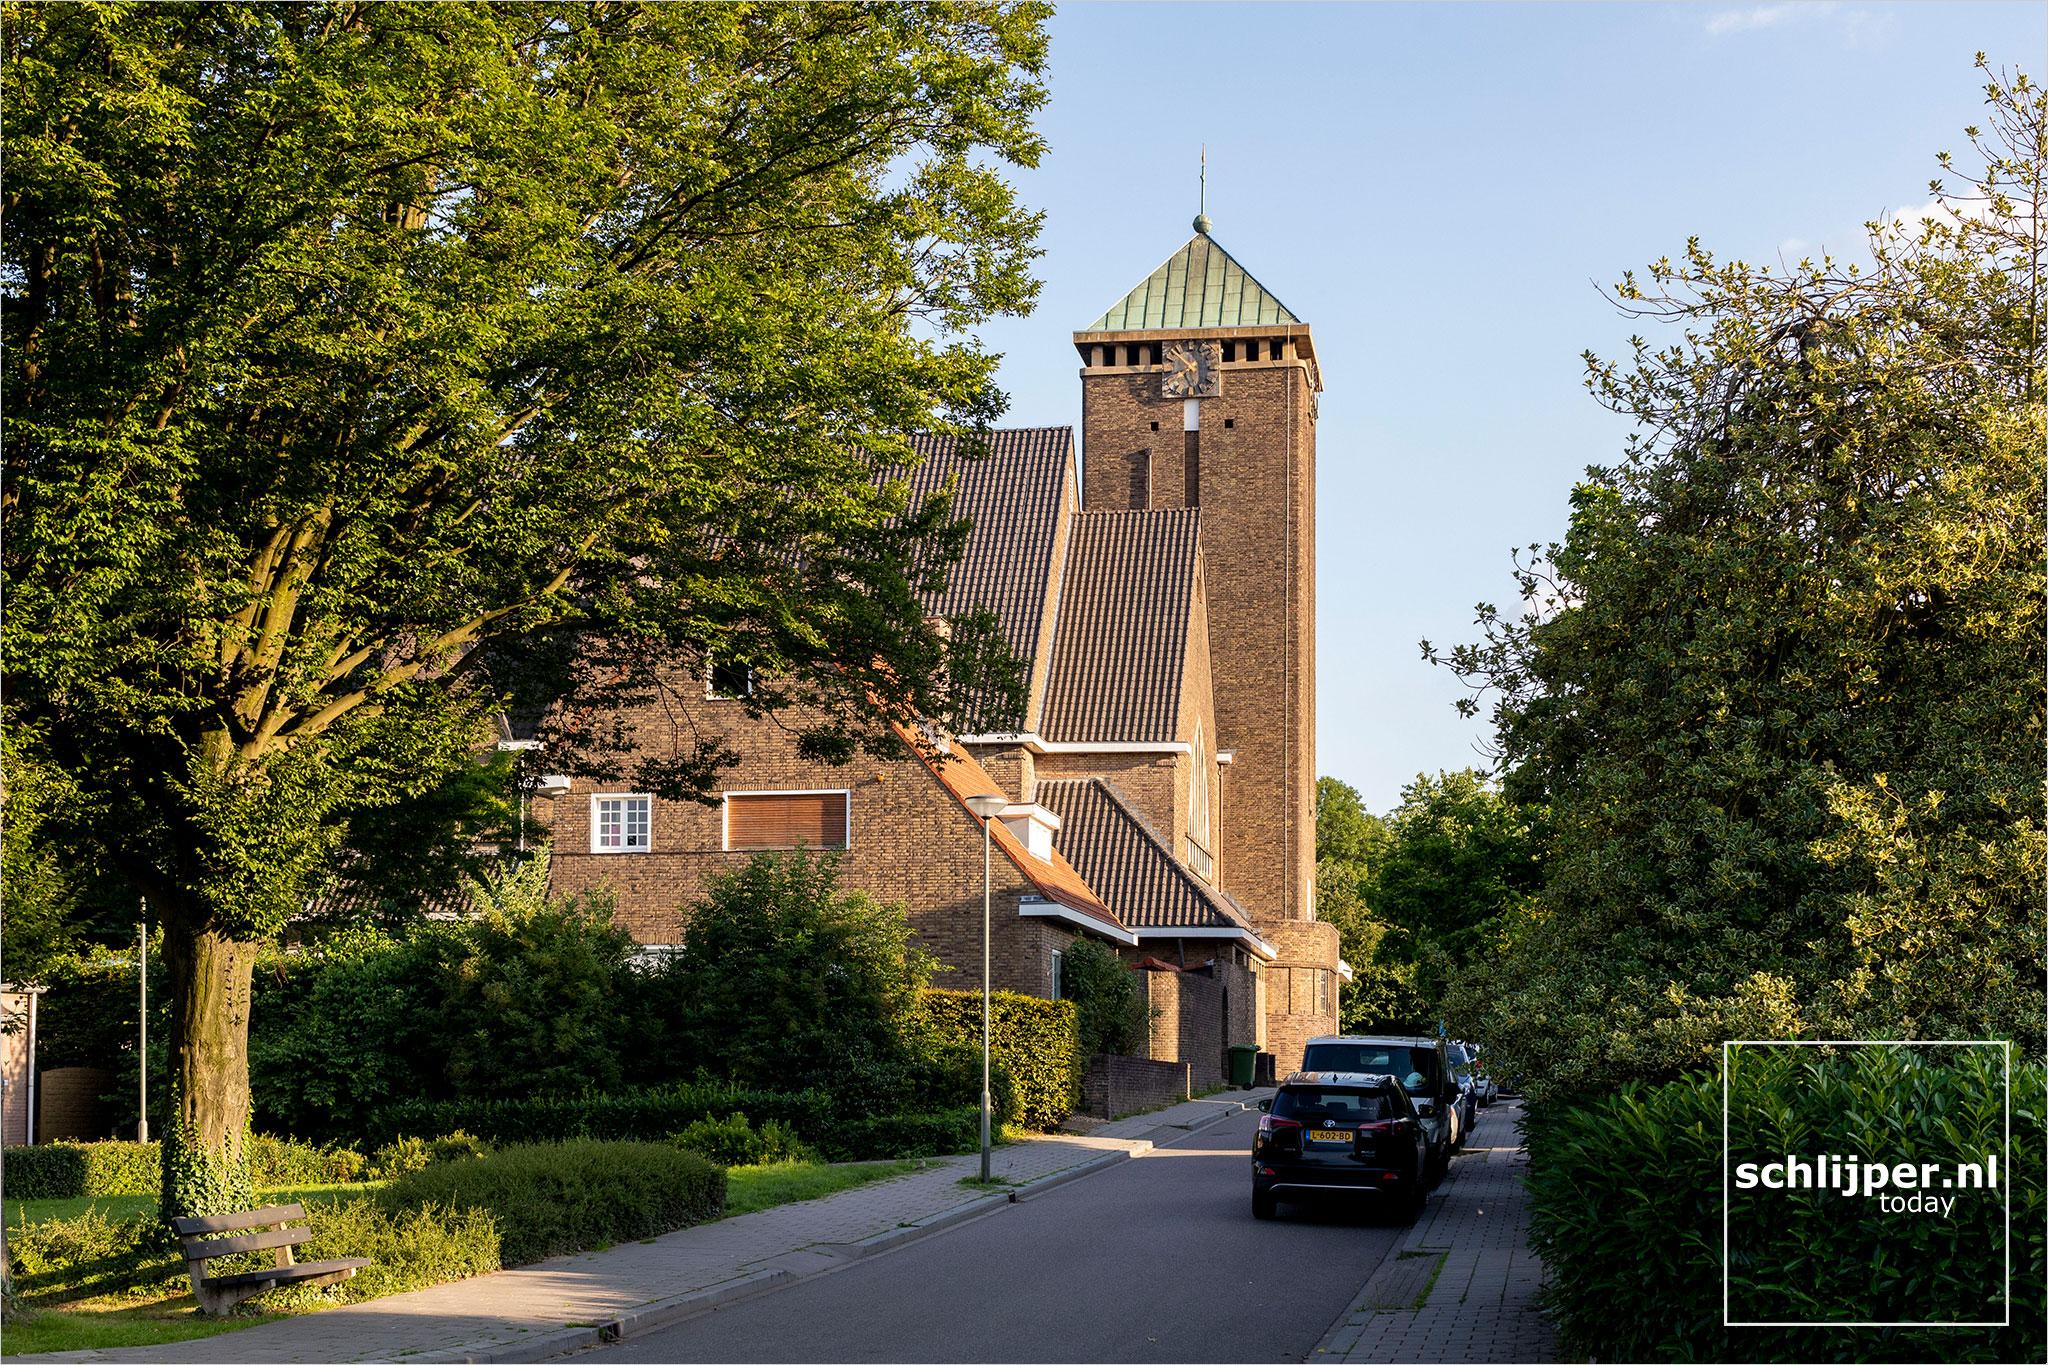 The Netherlands, Rothem, 18 juli 2021